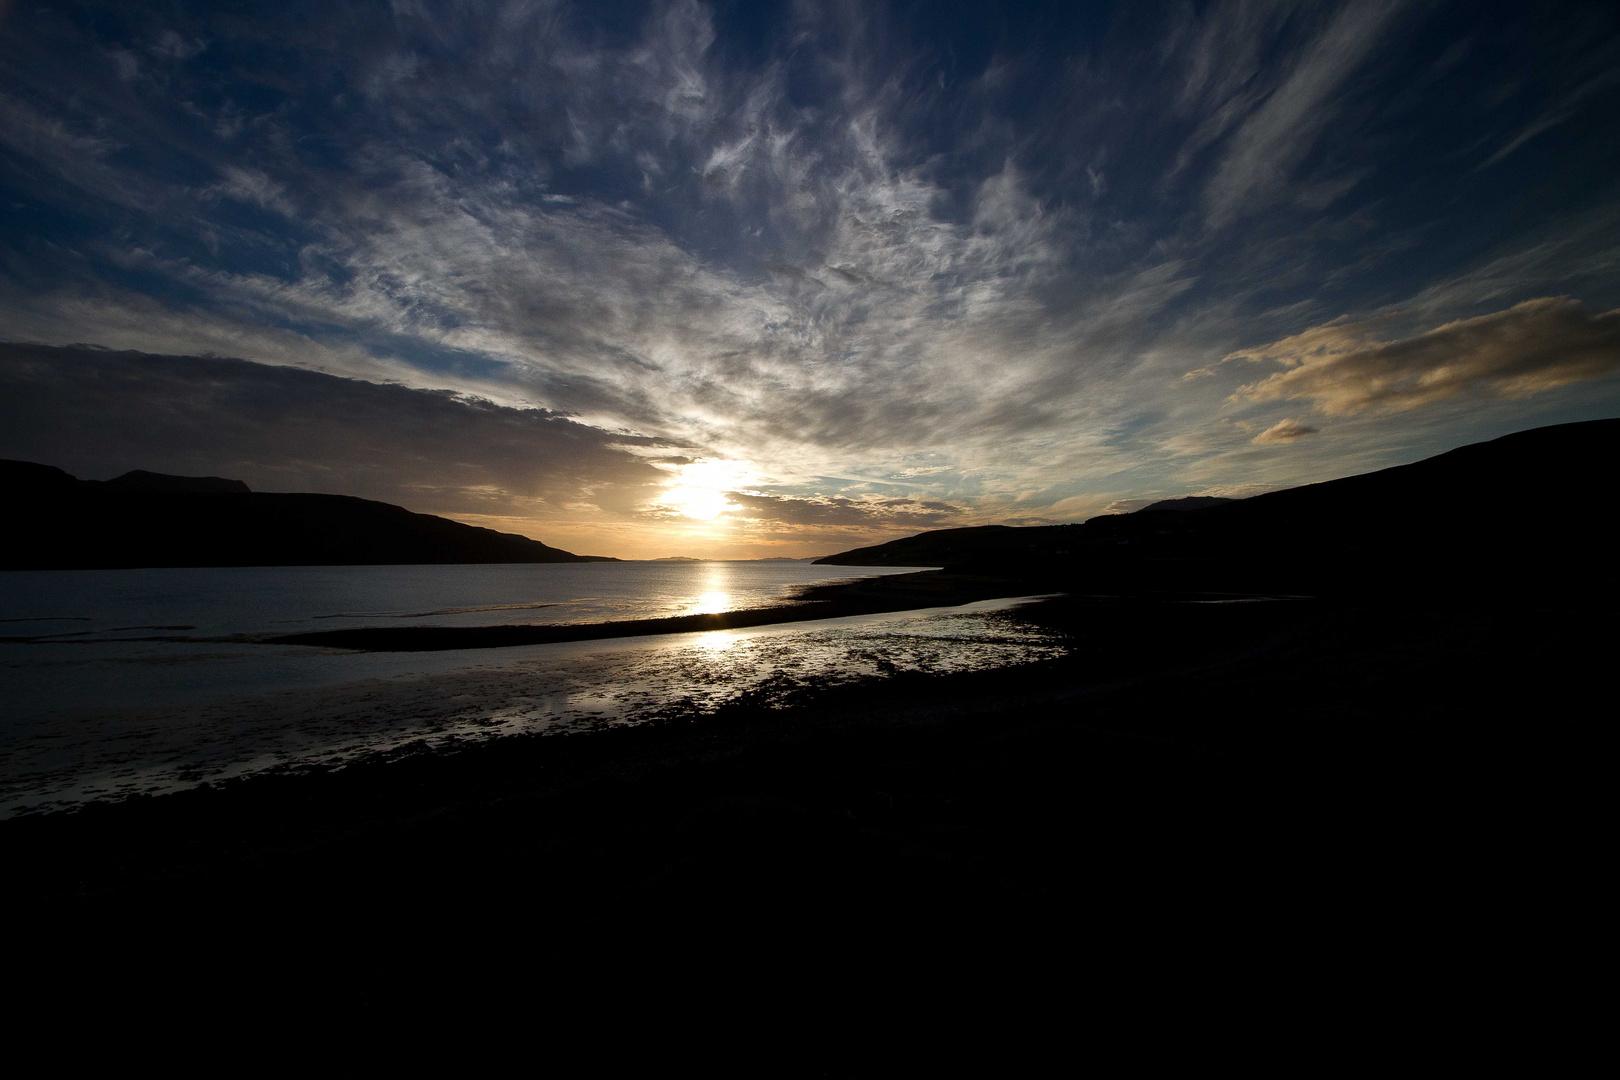 Sonnenuntergang in Ullapol